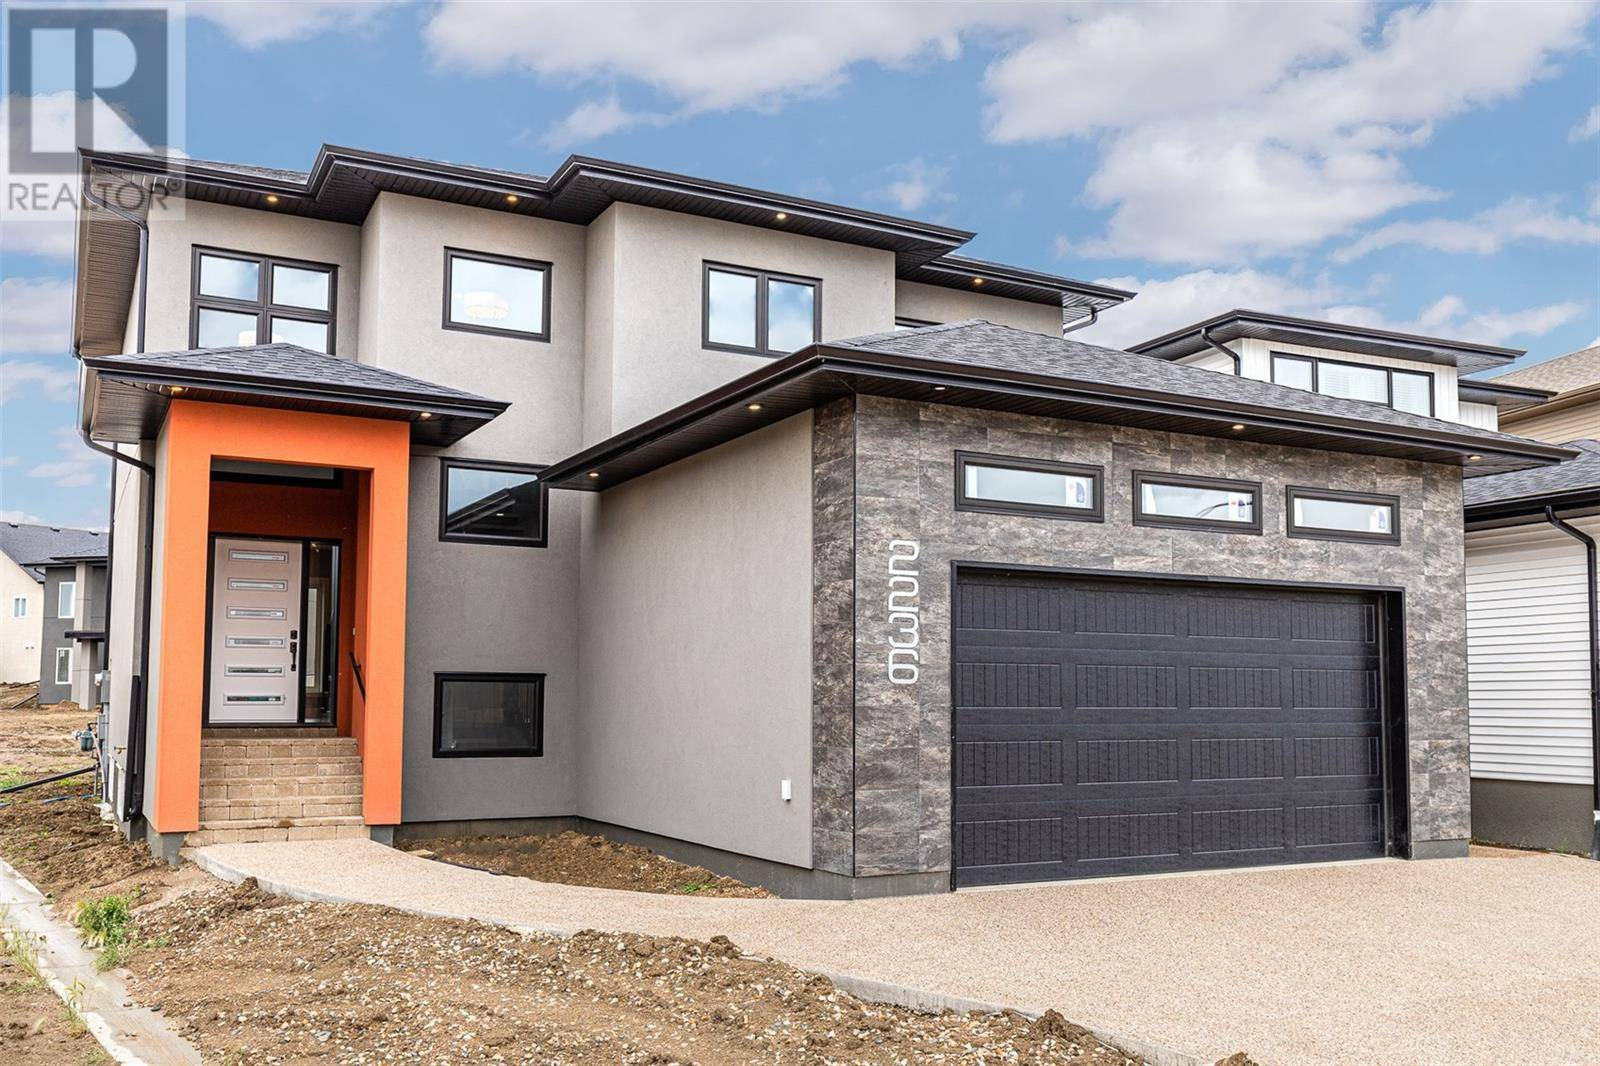 House for sale at 2236 Rosewood Dr Saskatoon Saskatchewan - MLS: SK786549